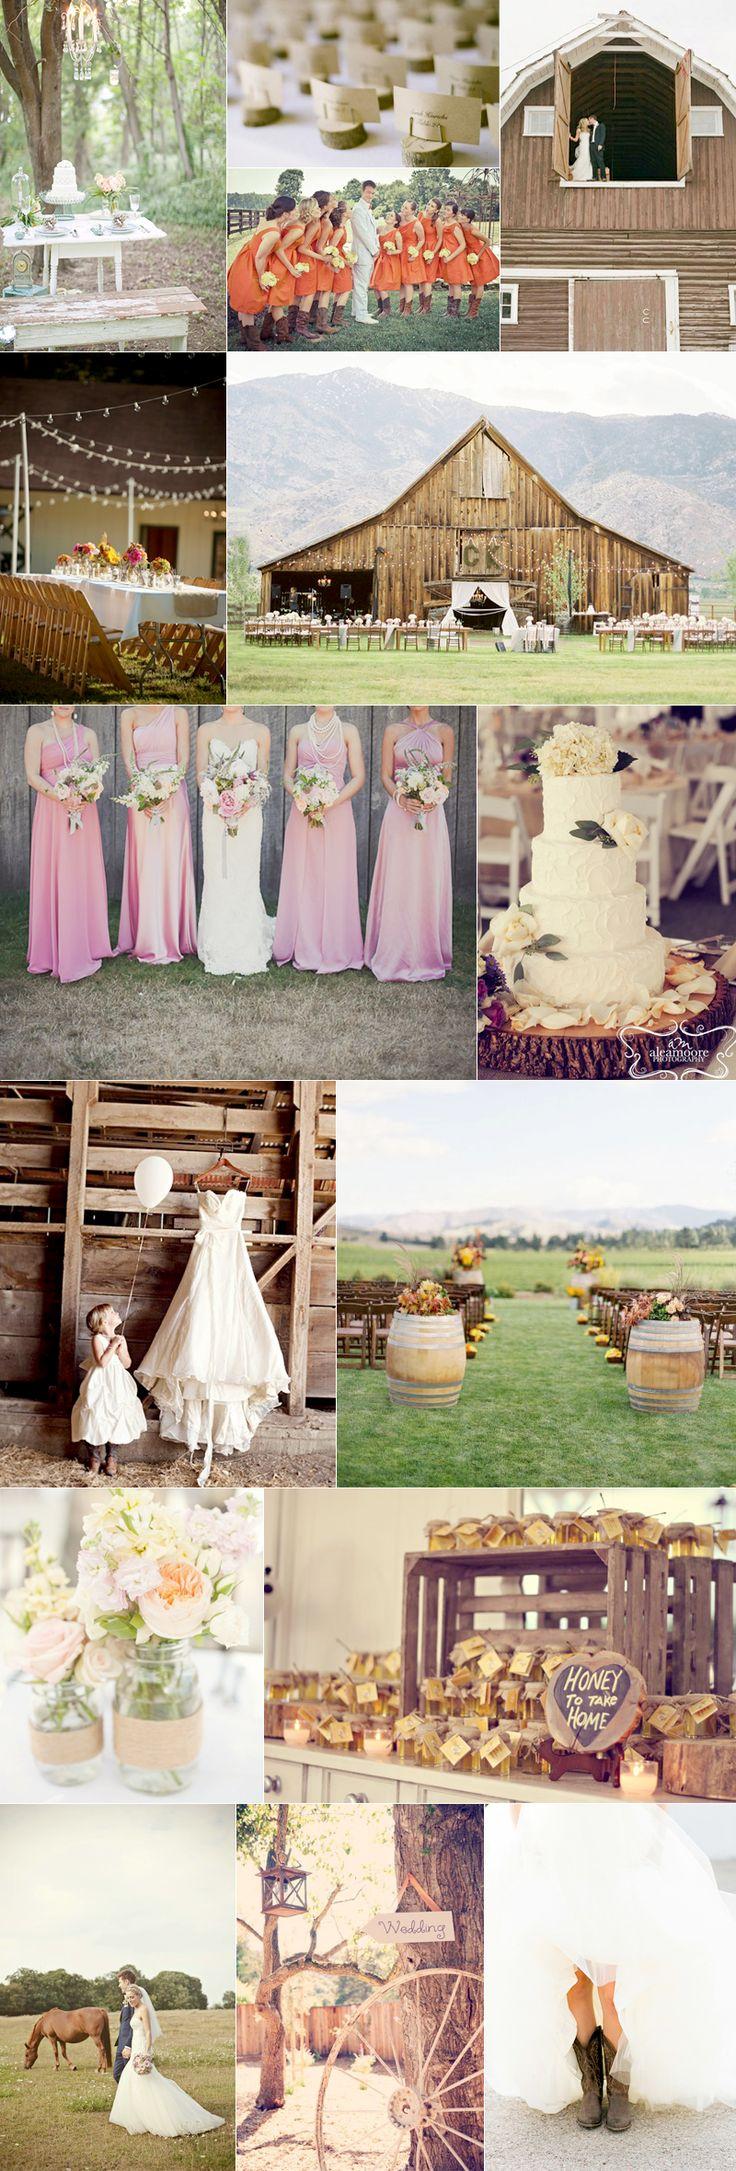 46 best Weddings images on Pinterest | Weddings, Canvas and Wedding ...